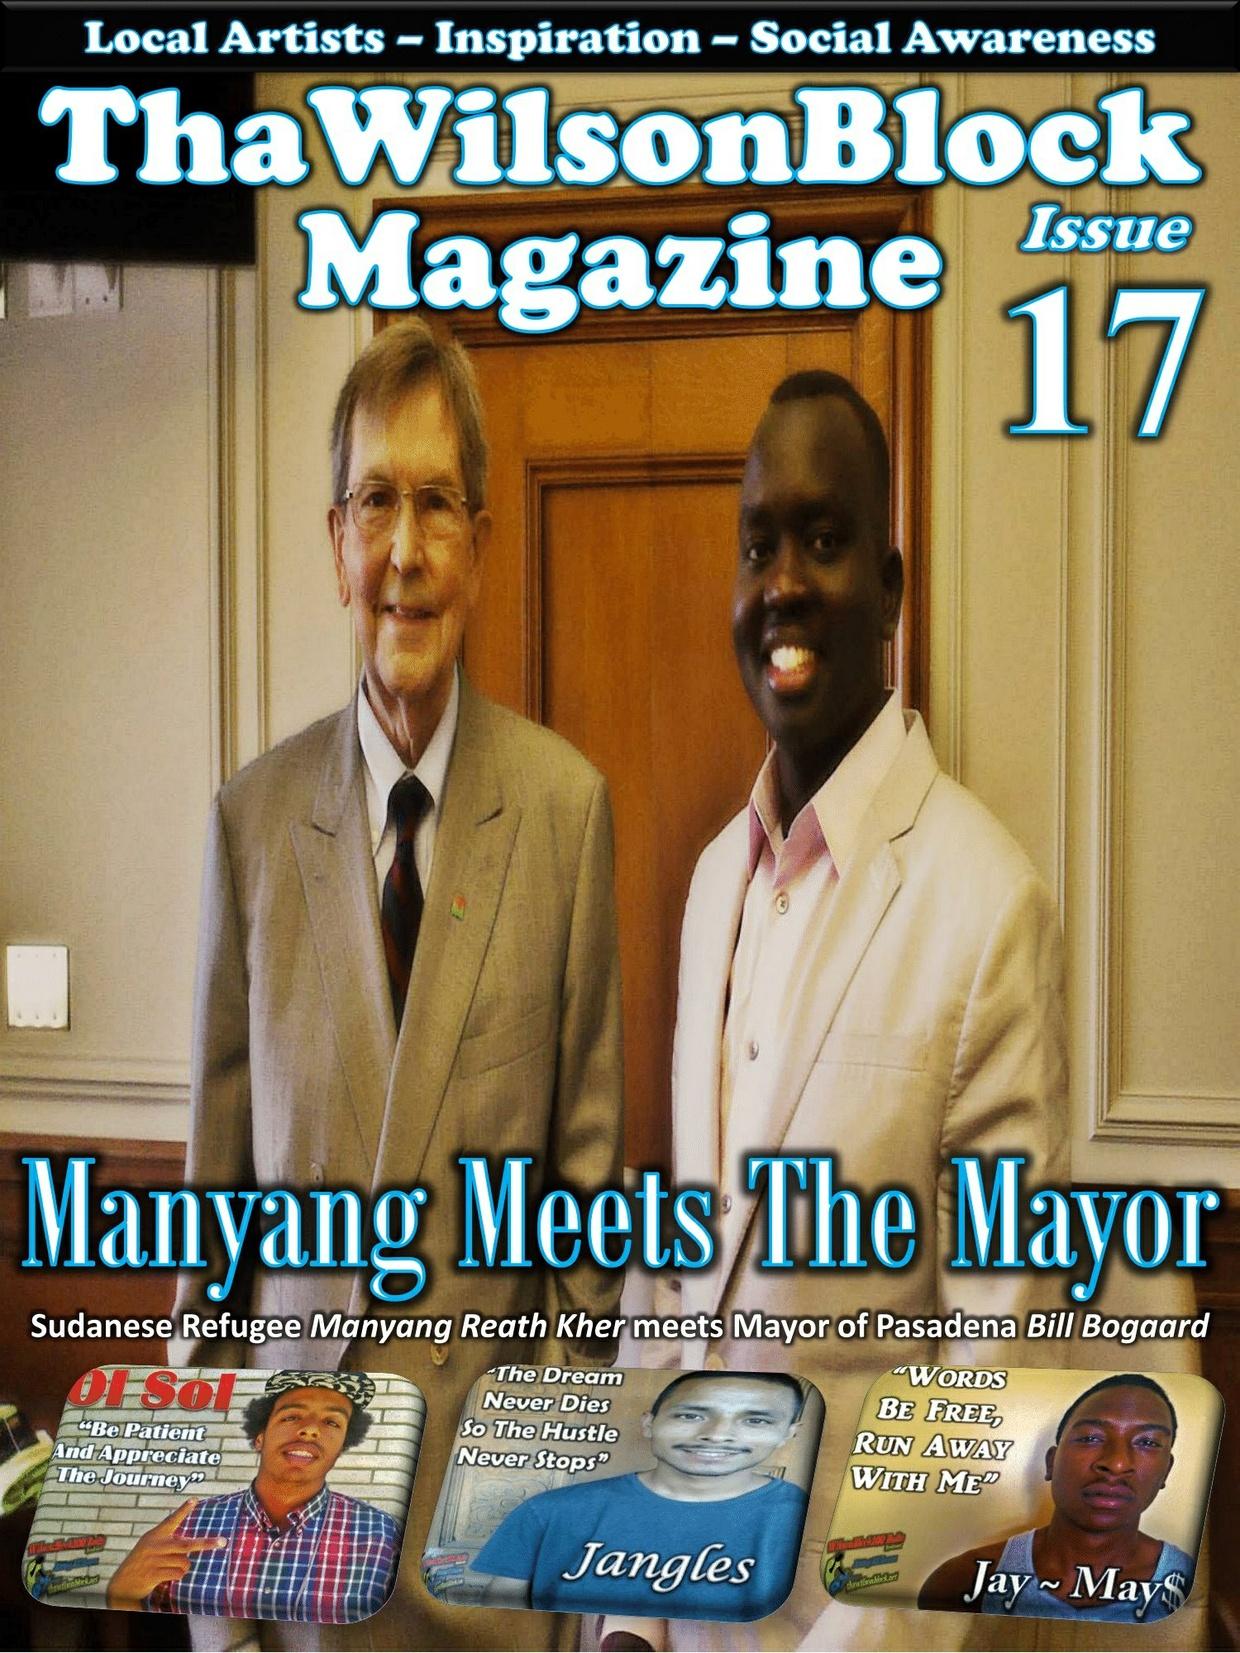 ThaWilsonBlock Magazine Issue17